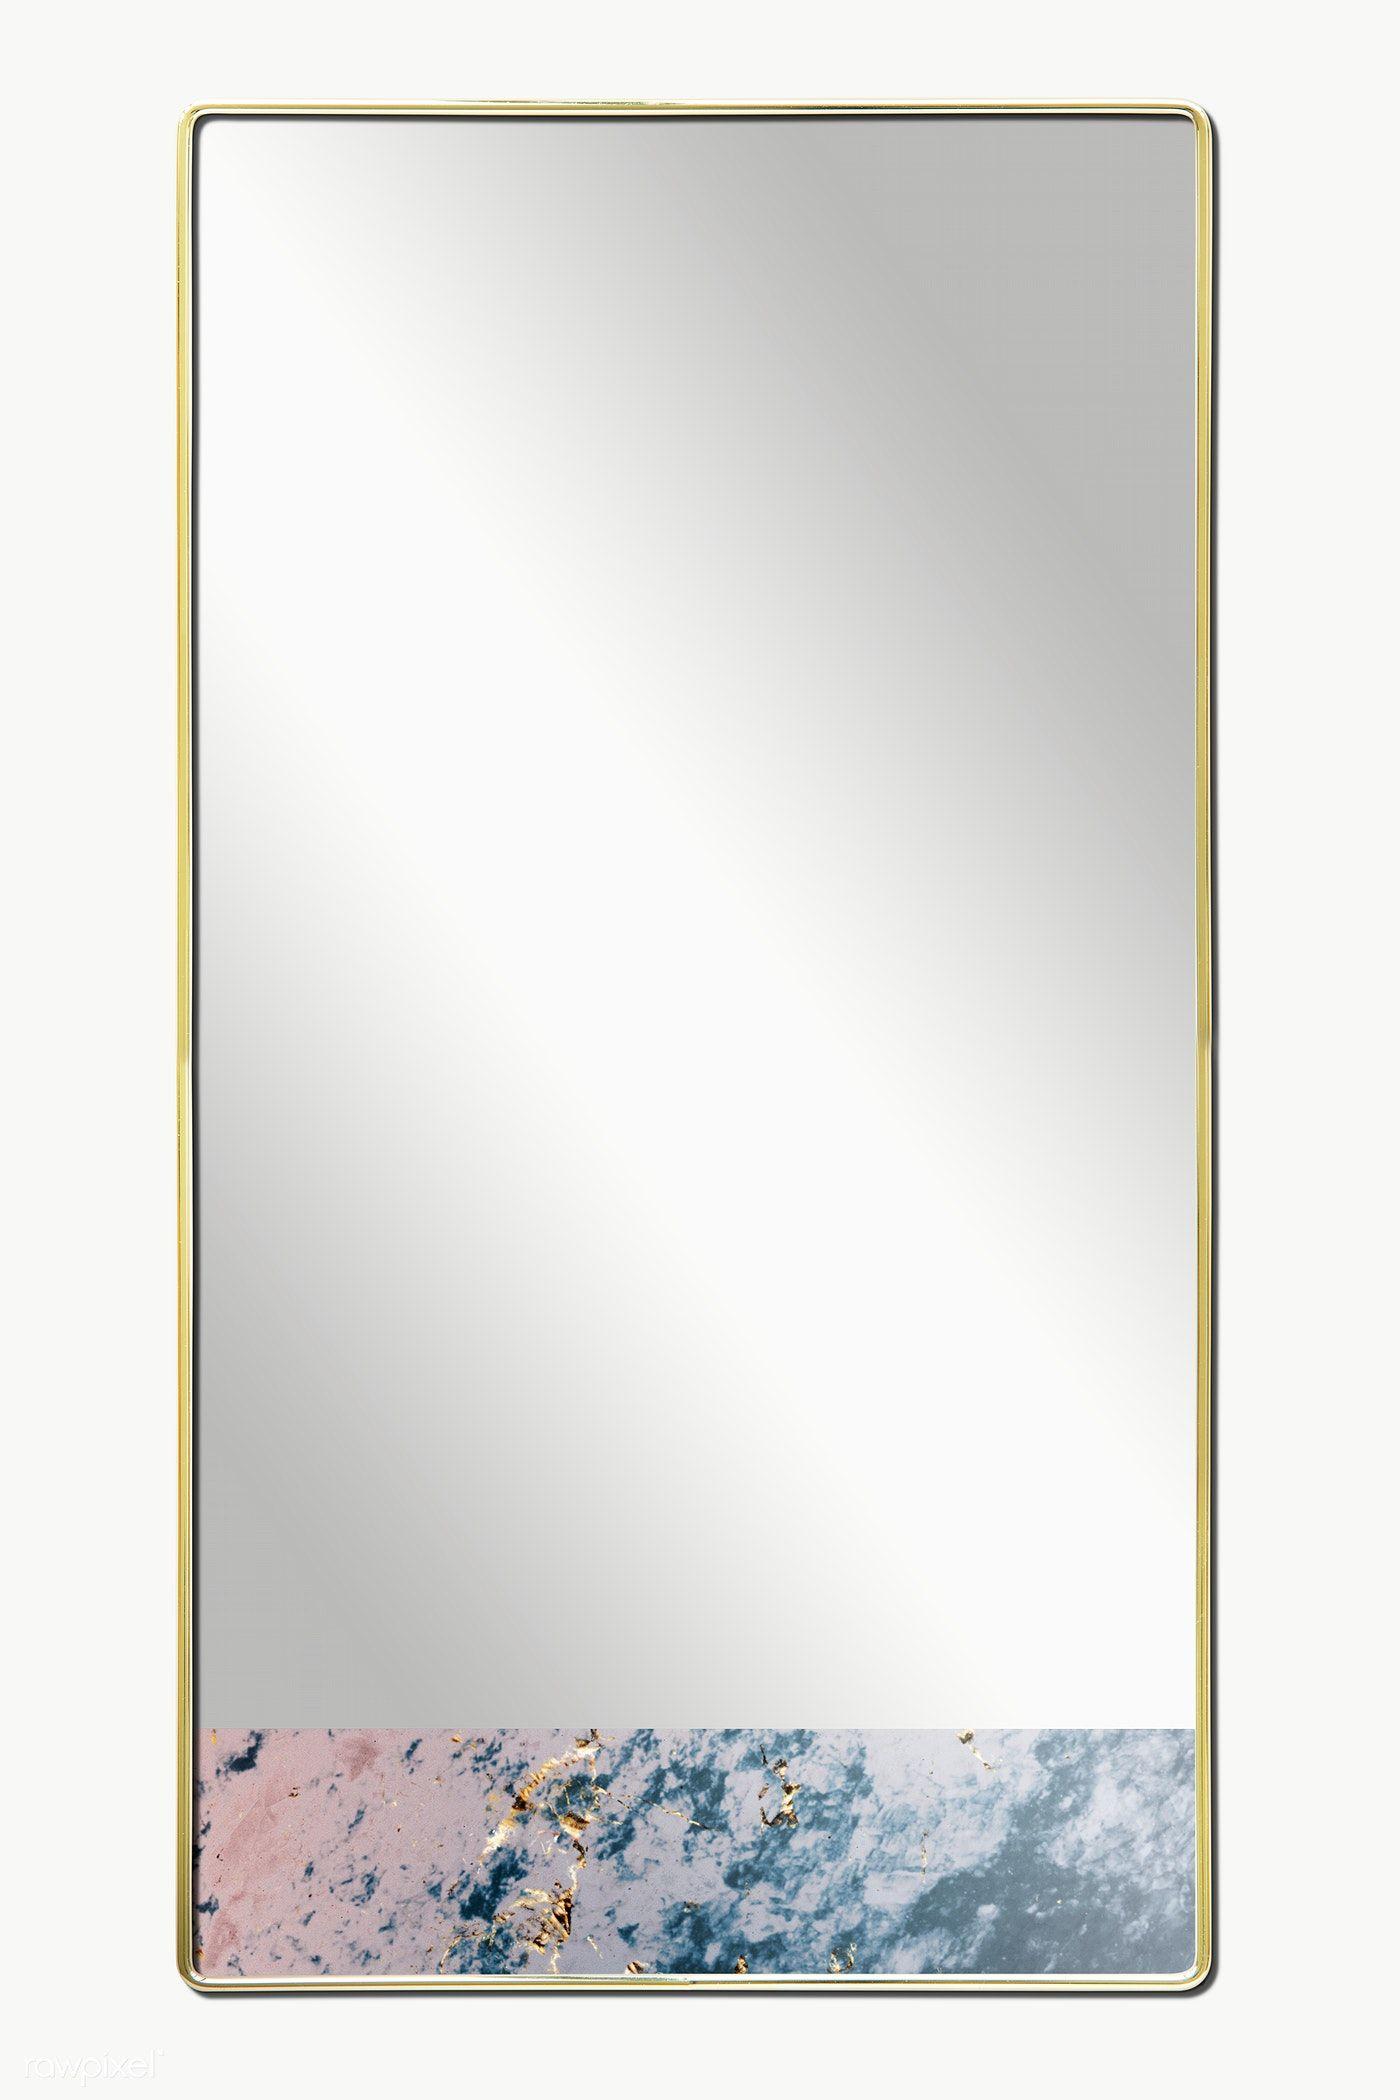 Download Premium Png Of Gold Framed Mirror Mockup Transparent Png 2036855 Gold Framed Mirror Marble Frame Mirror Mirror Frames